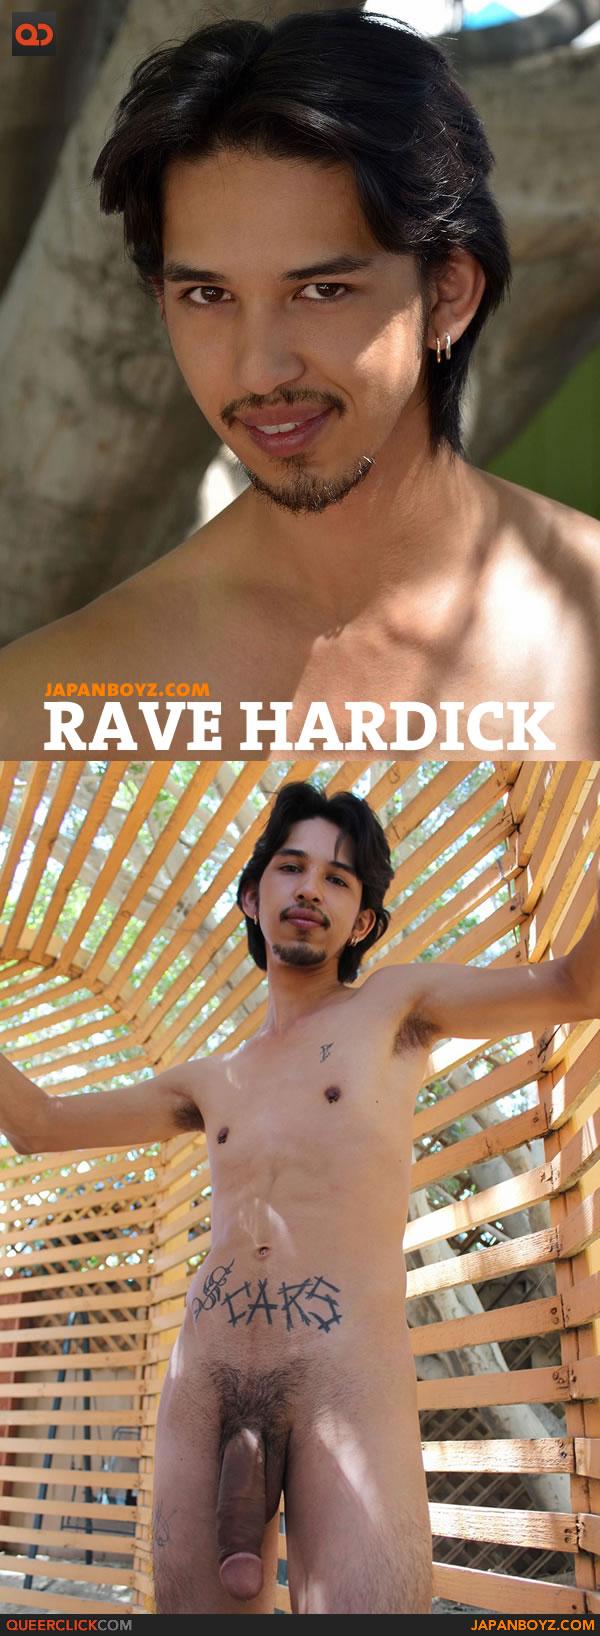 rave hardick